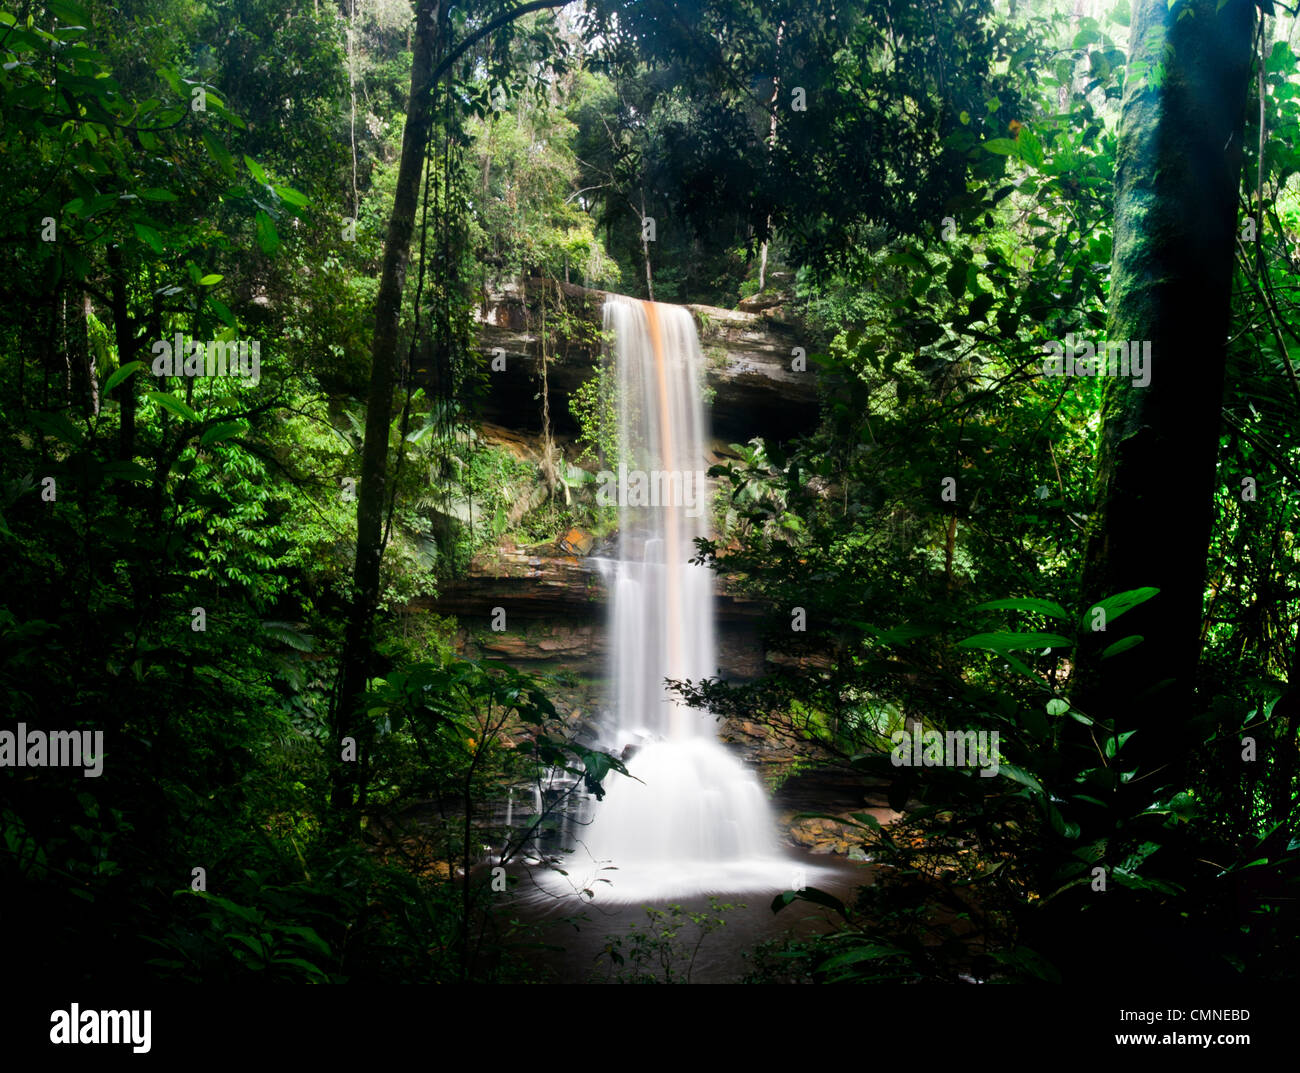 Takob-Akob Falls, edge of southern plateau, Maliau Basin. Sabah's 'Lost World', Borneo. - Stock Image